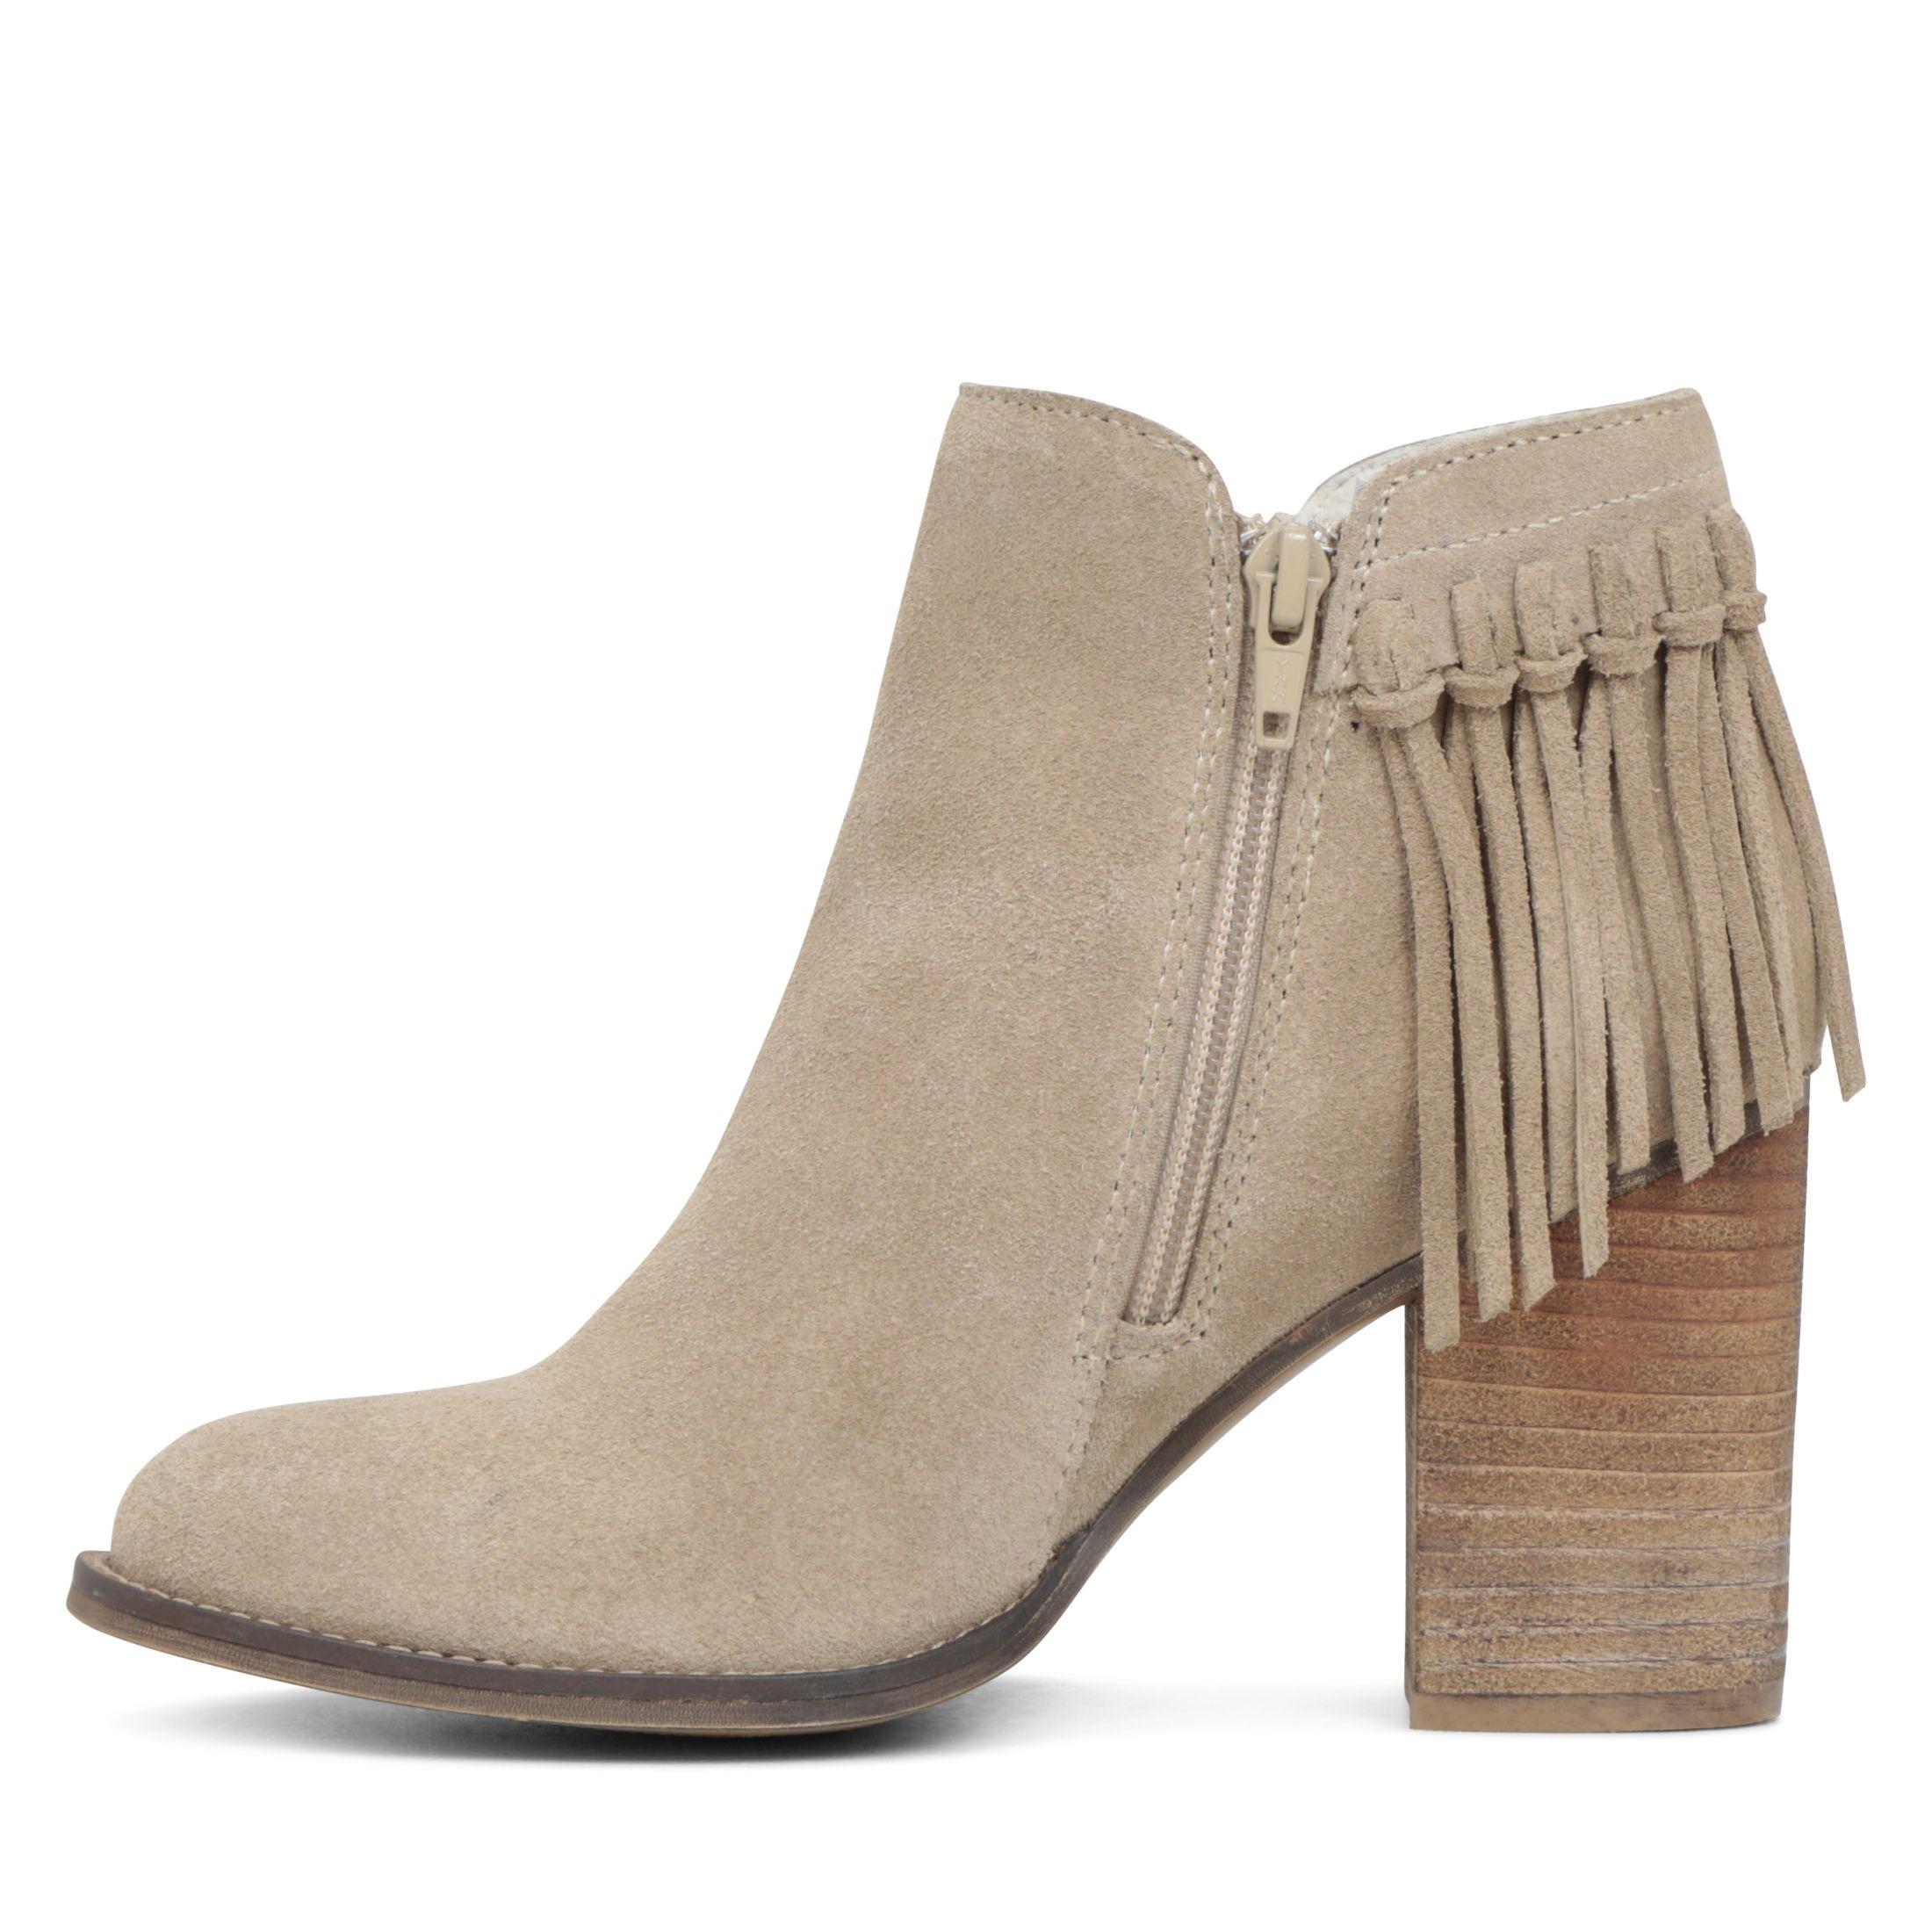 Aldo Casalnuoyo Fringe Ankle Boots in Brown | Lyst